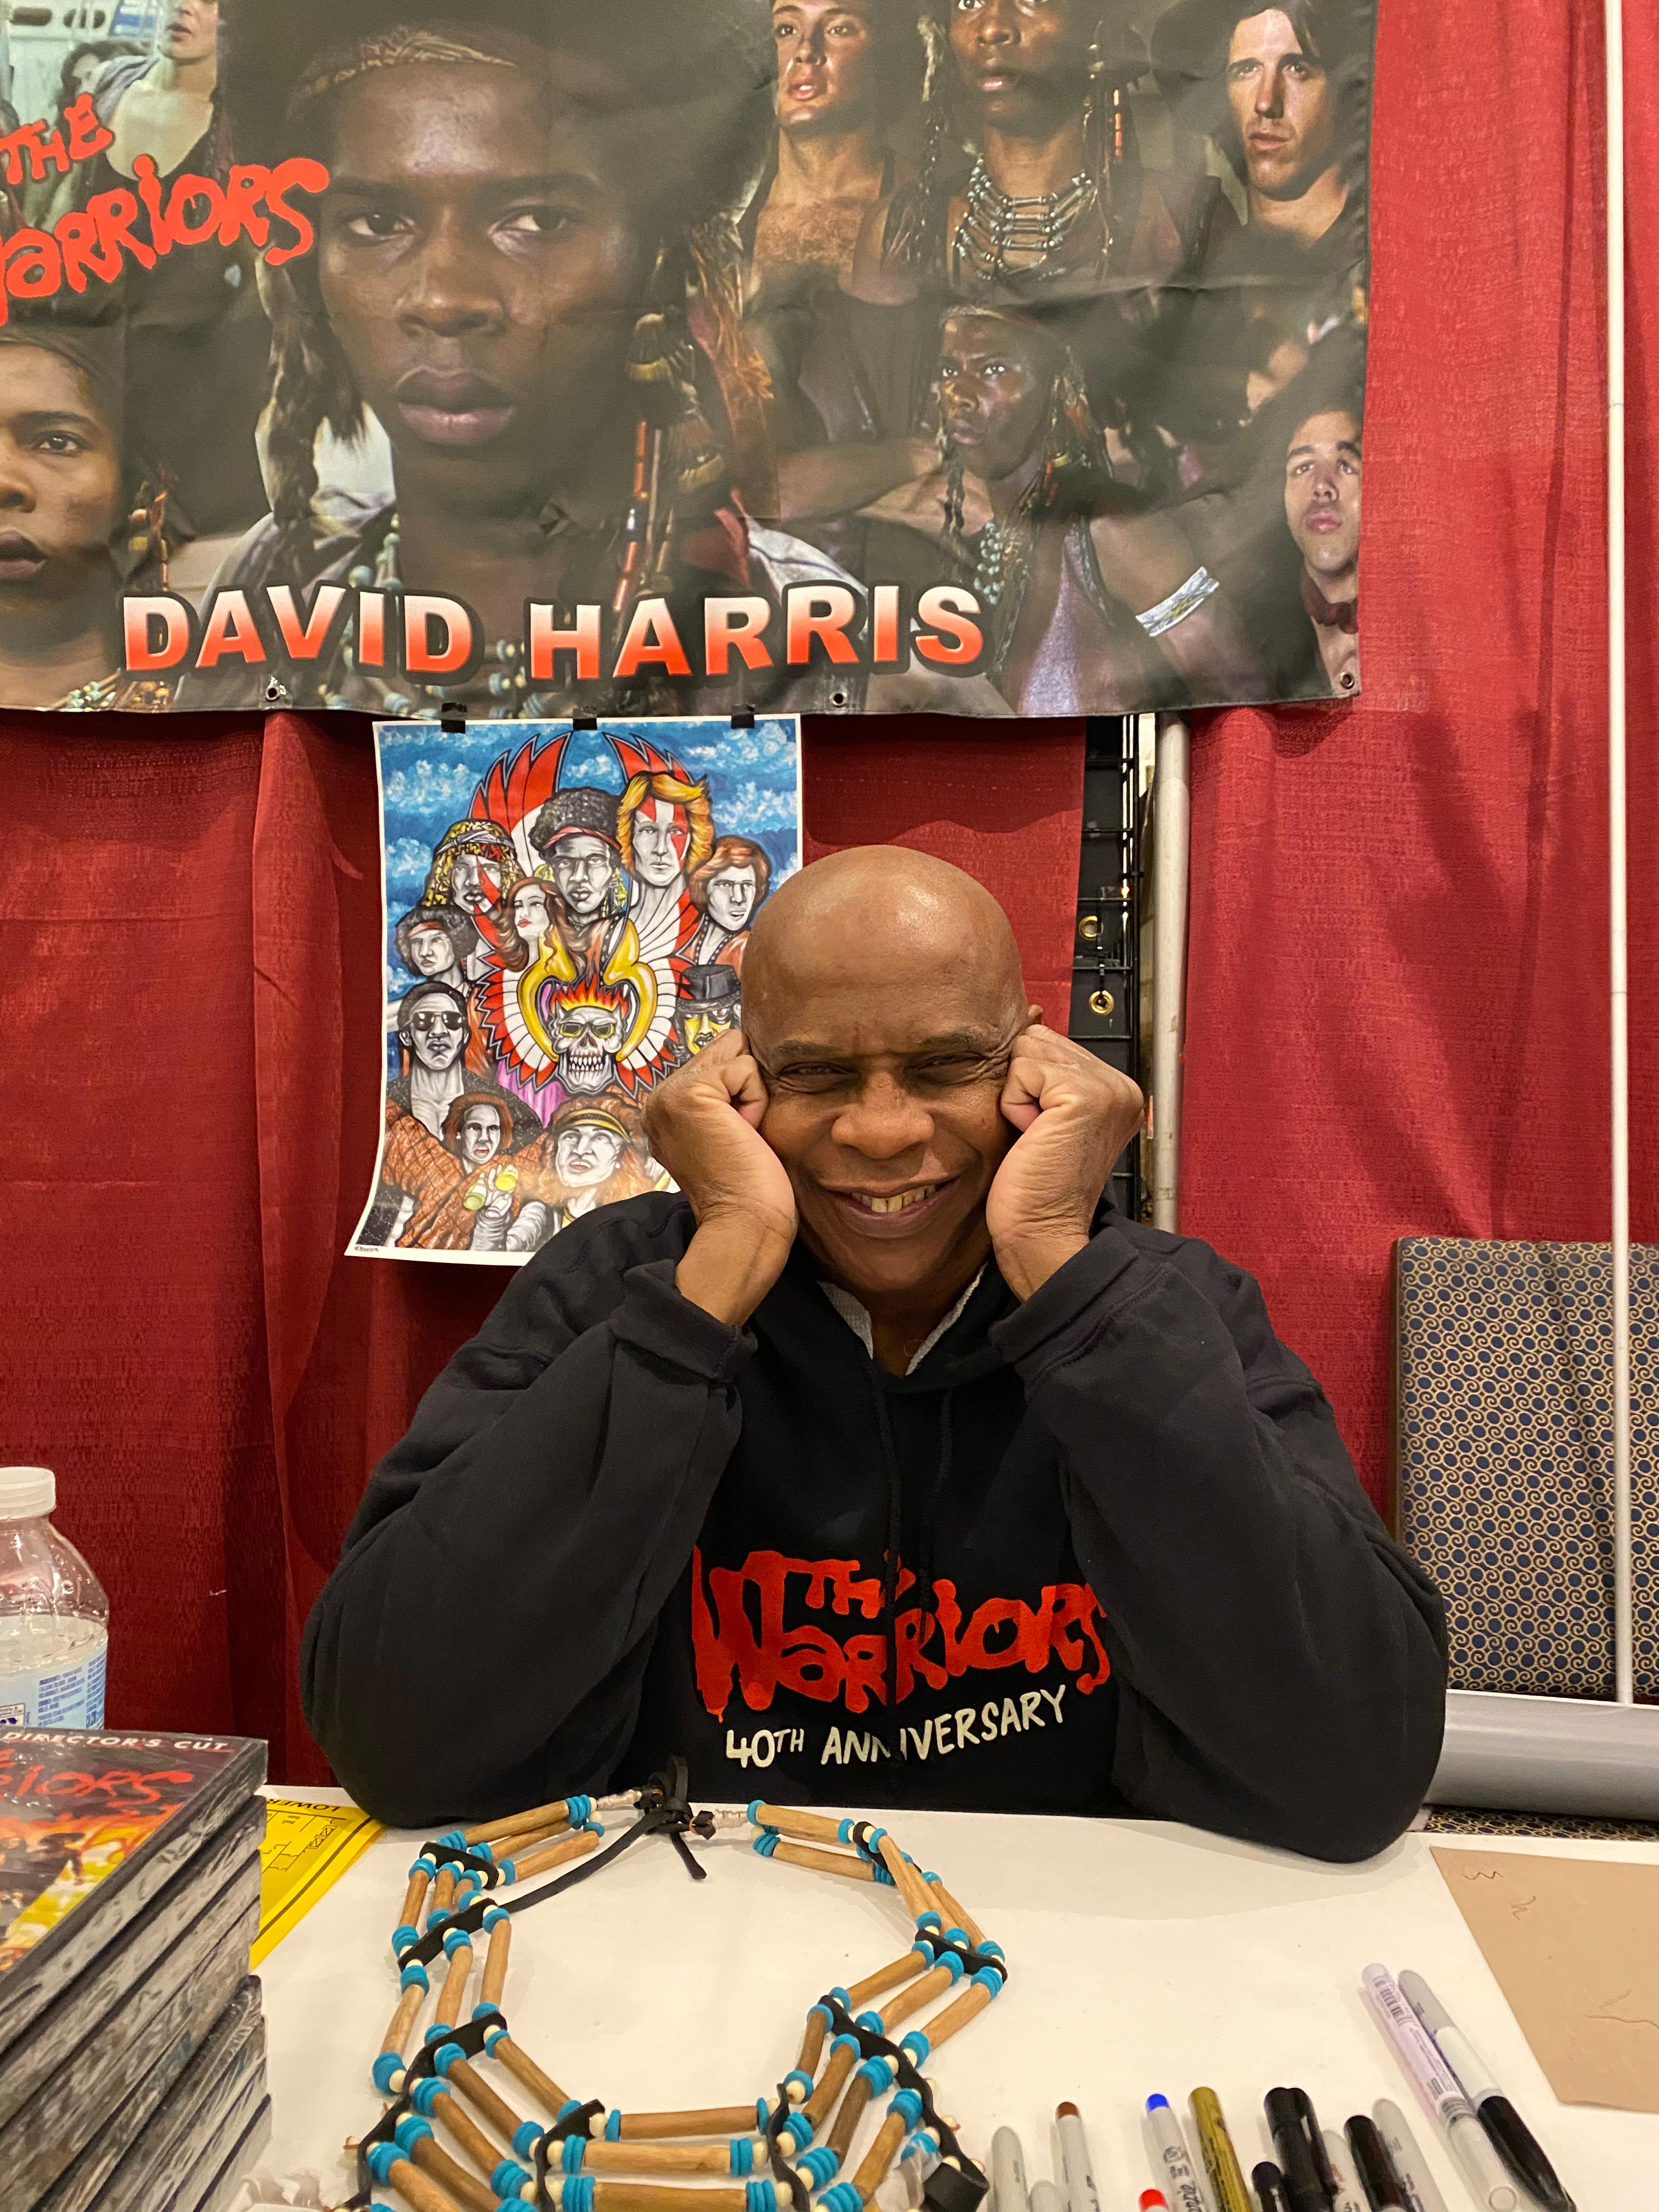 David Harris (The Warriors).